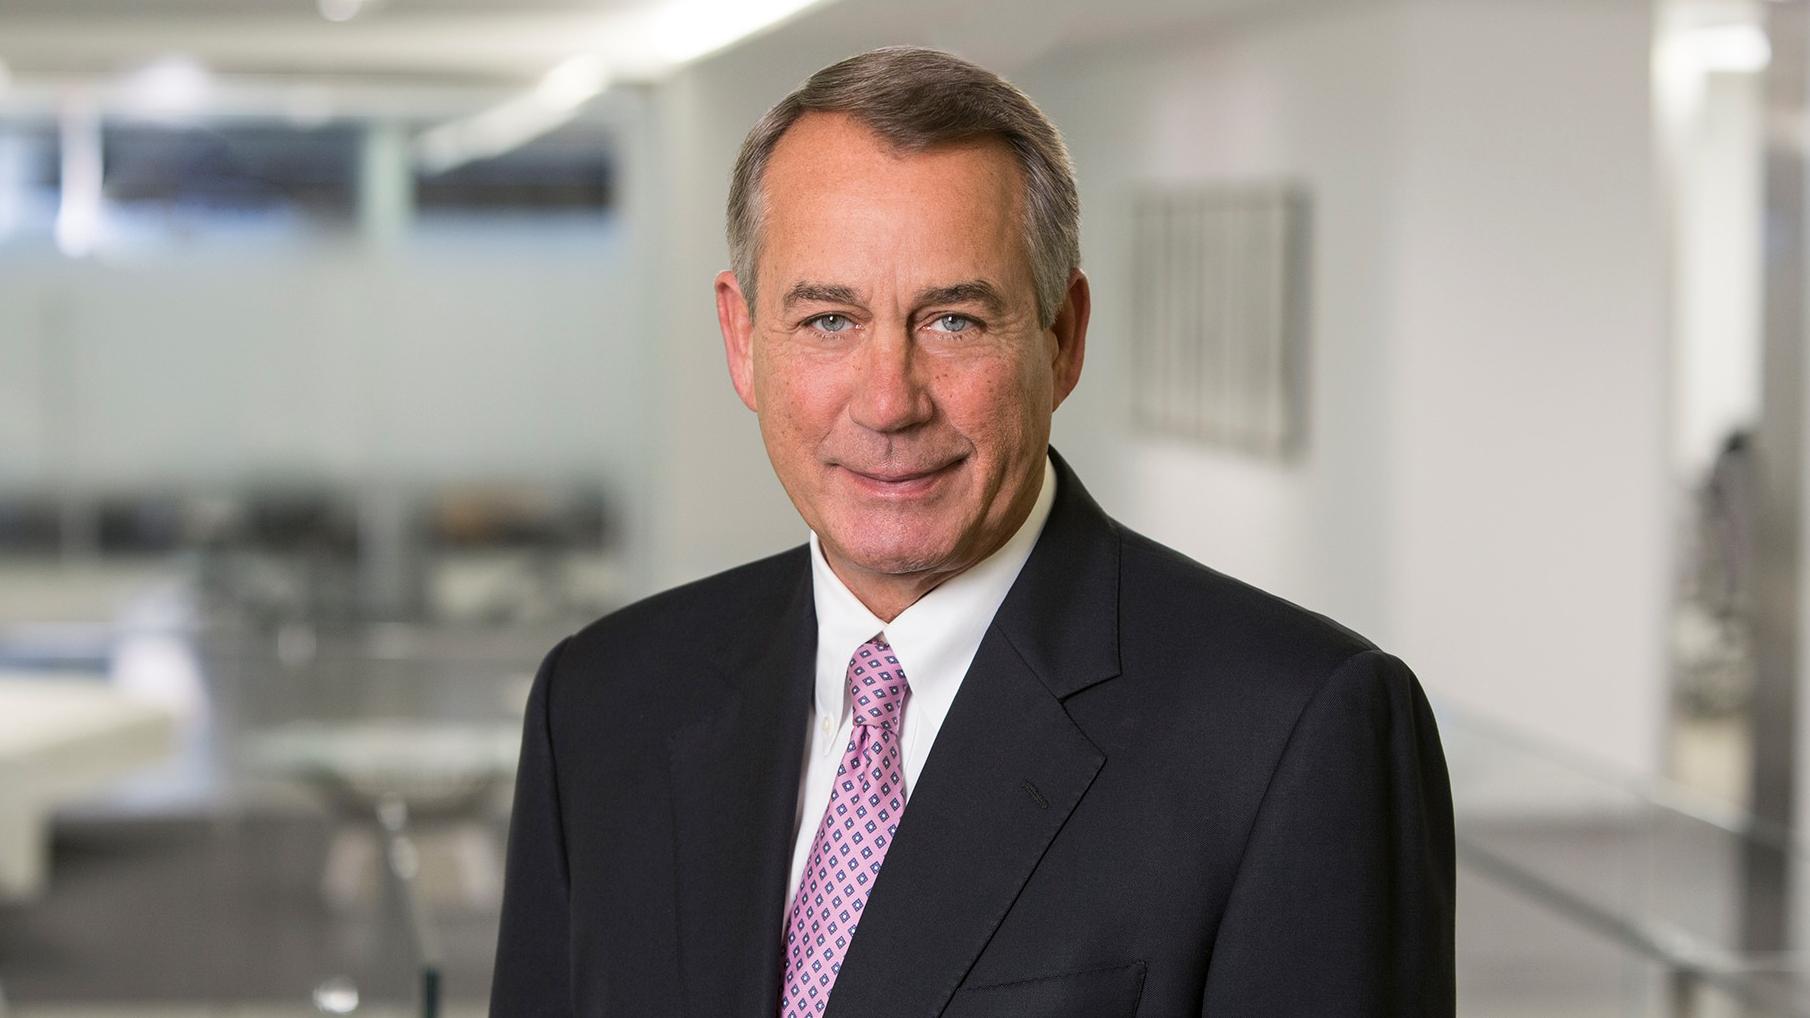 2019 SXSW Keynote, John Boehner